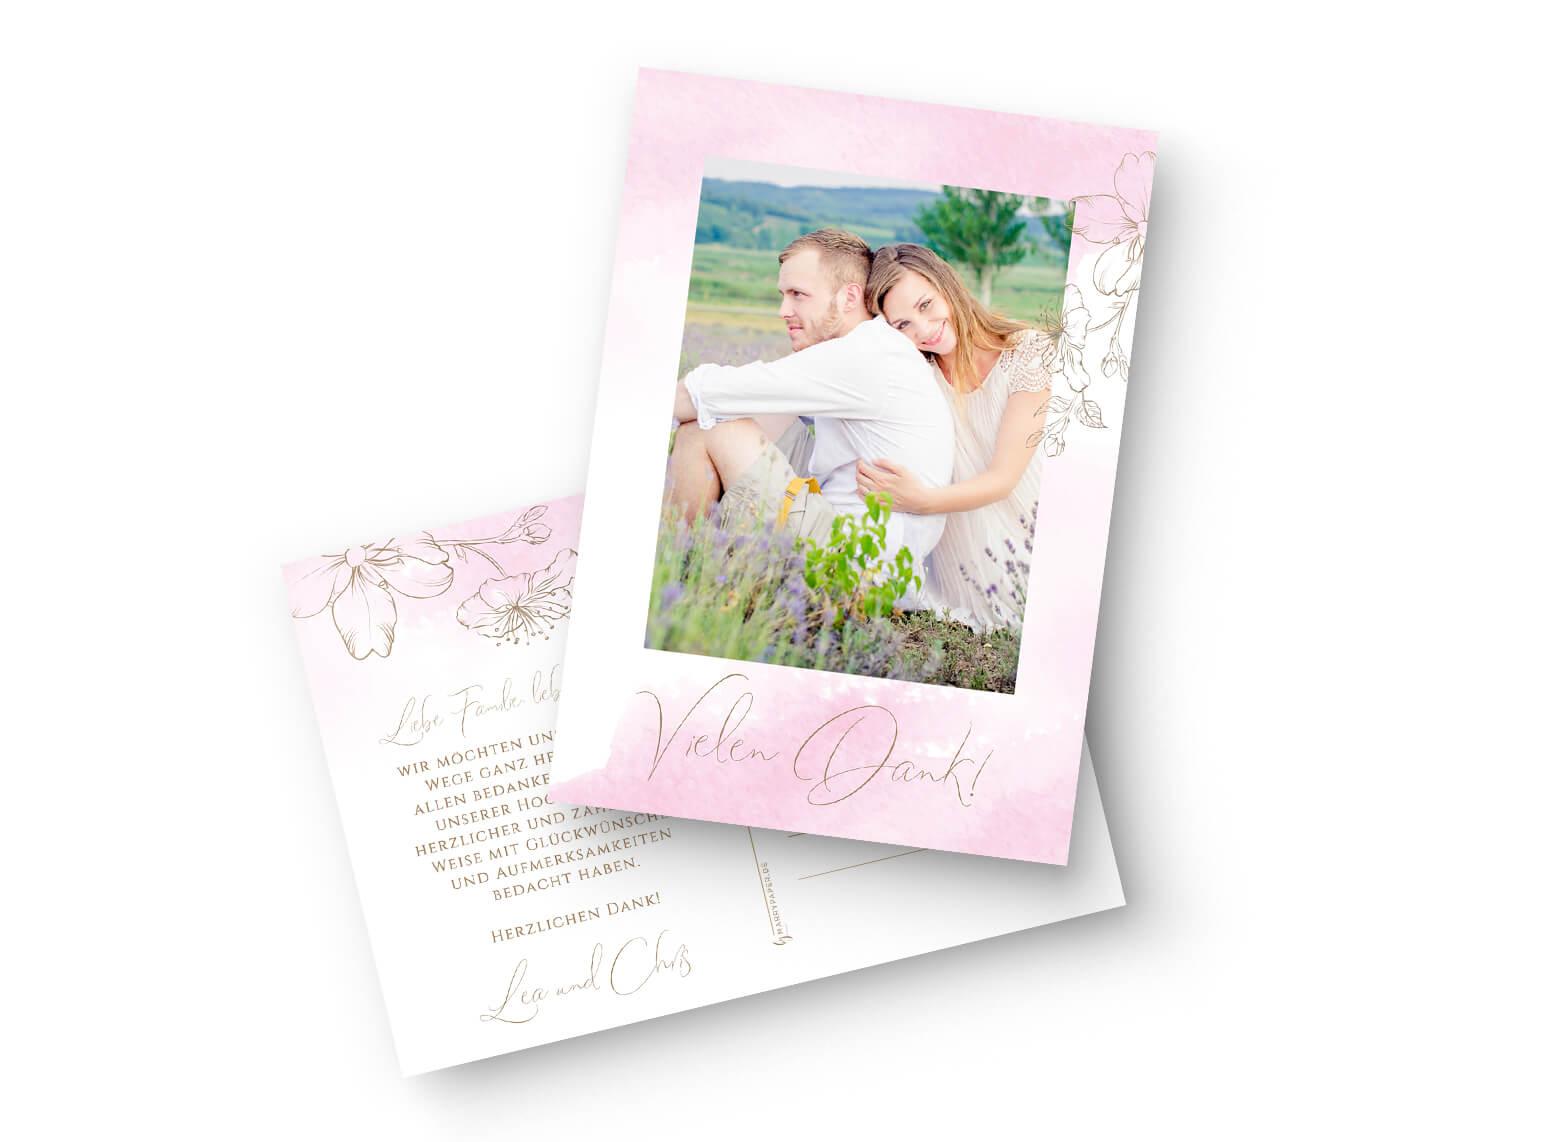 hochzeit-dankeskarte-karte-dina-6-rosa-aquarell-gold-blumen_front_MP0013-7.1_kl